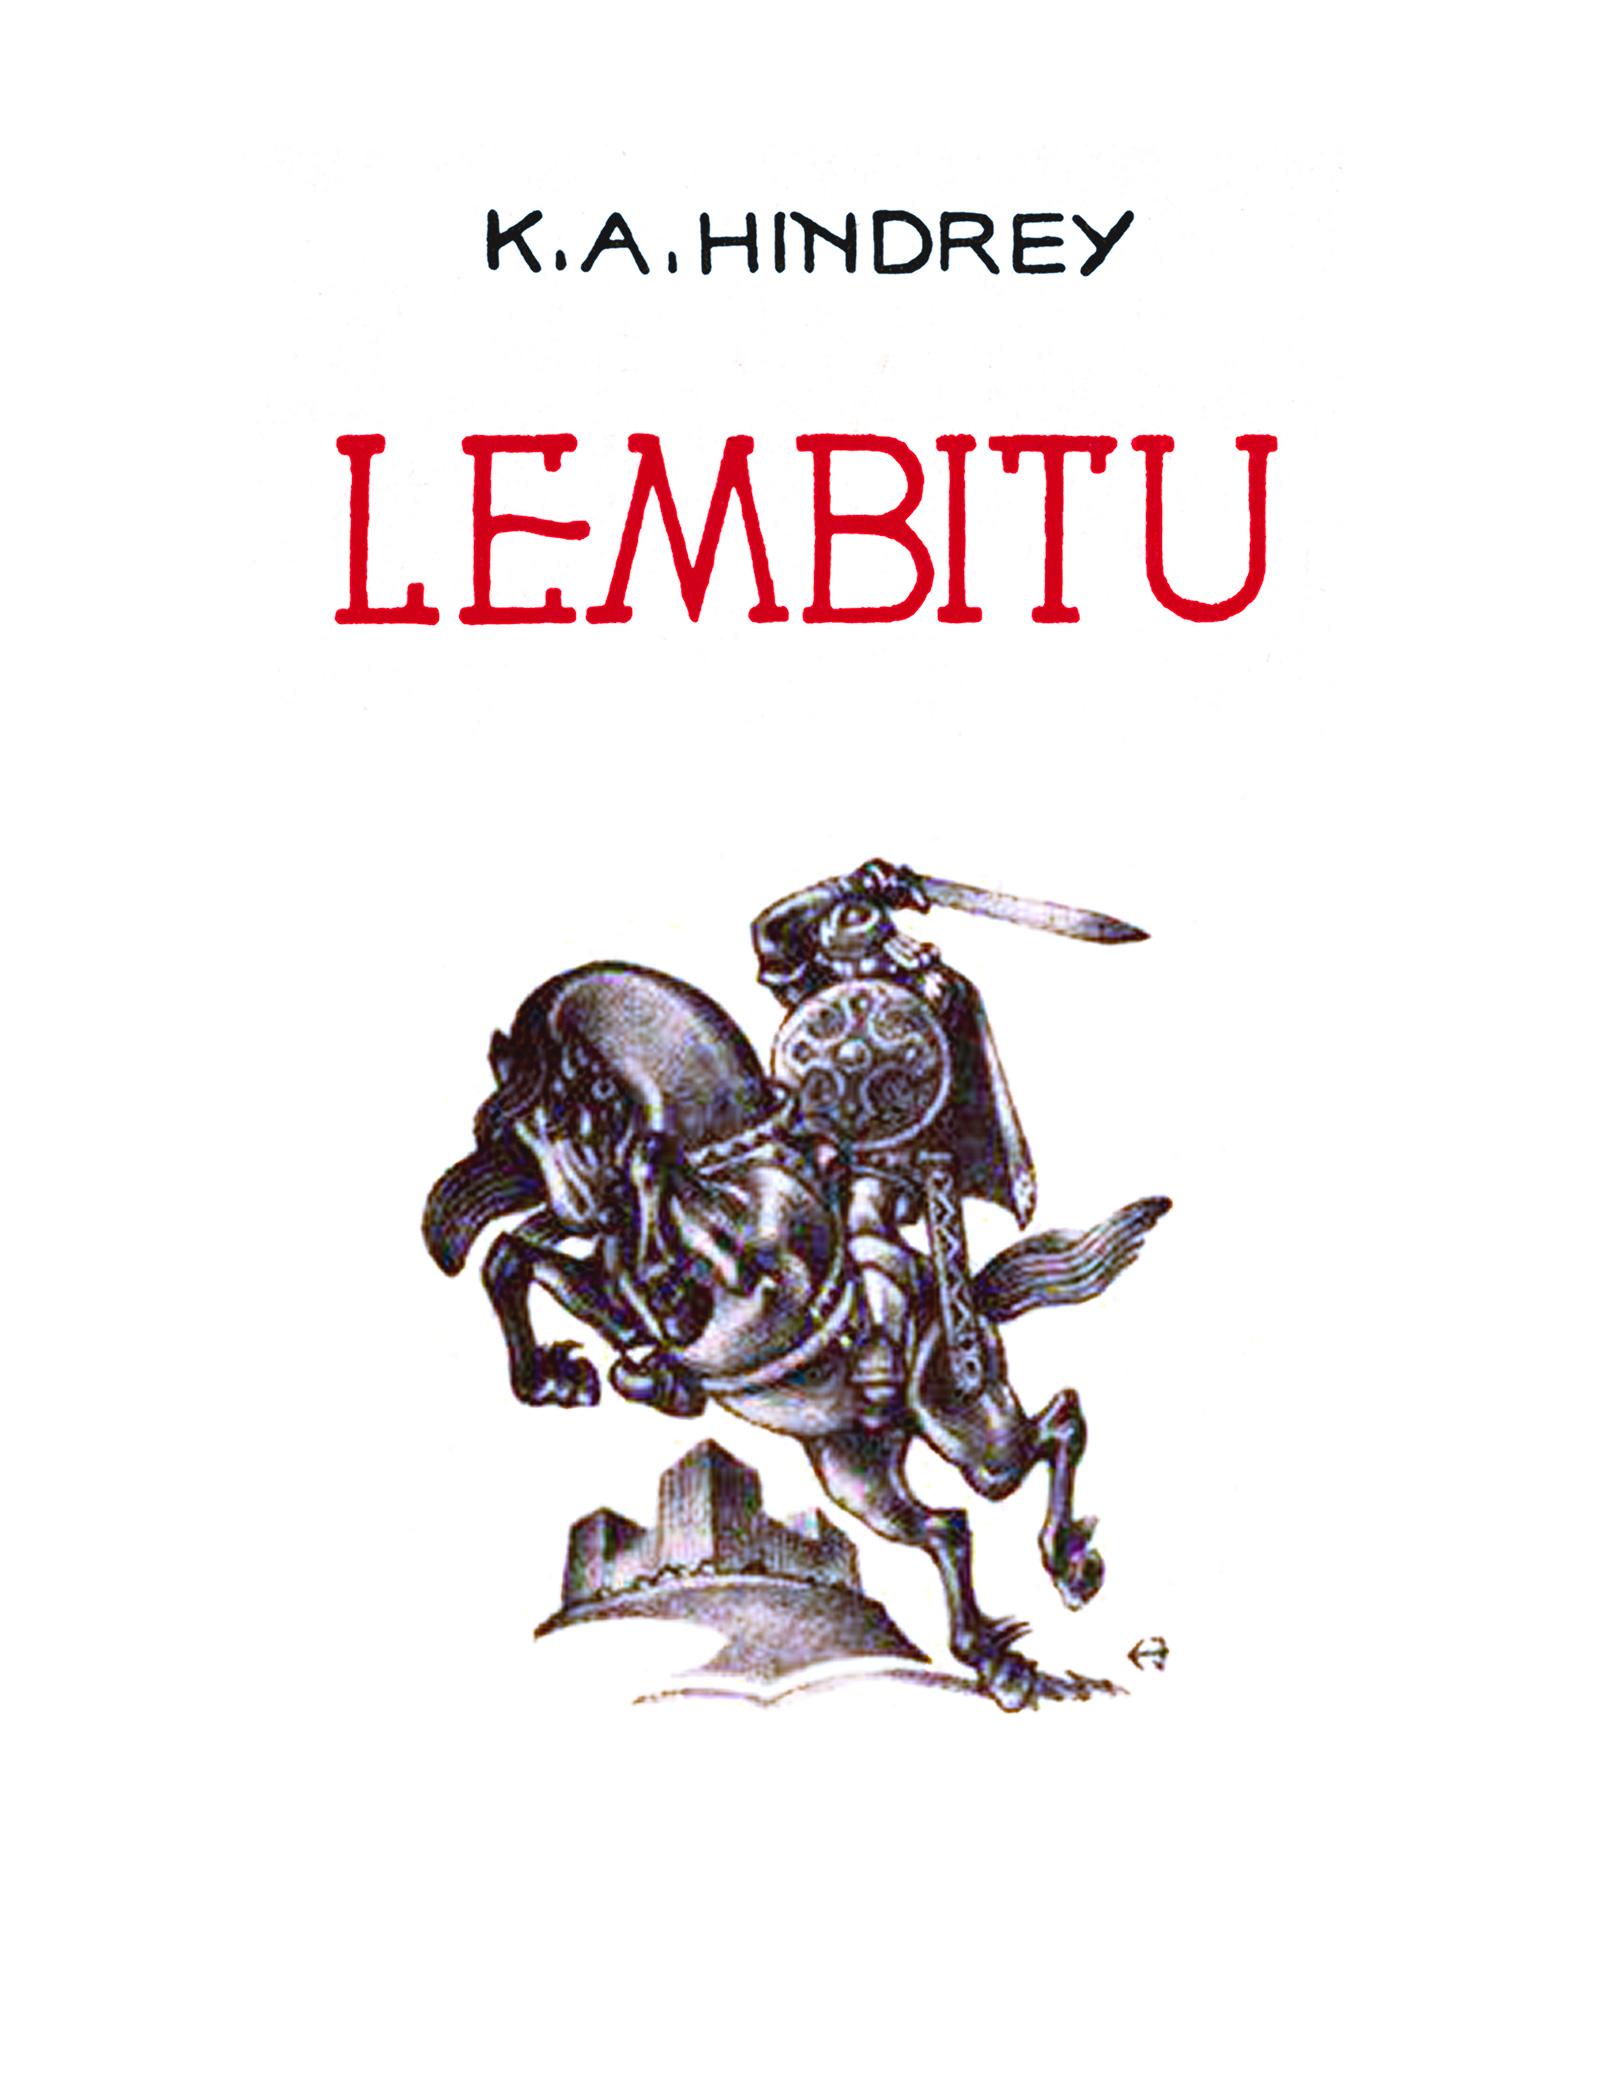 Karl August Hindrey Lembitu mart helme lembitu